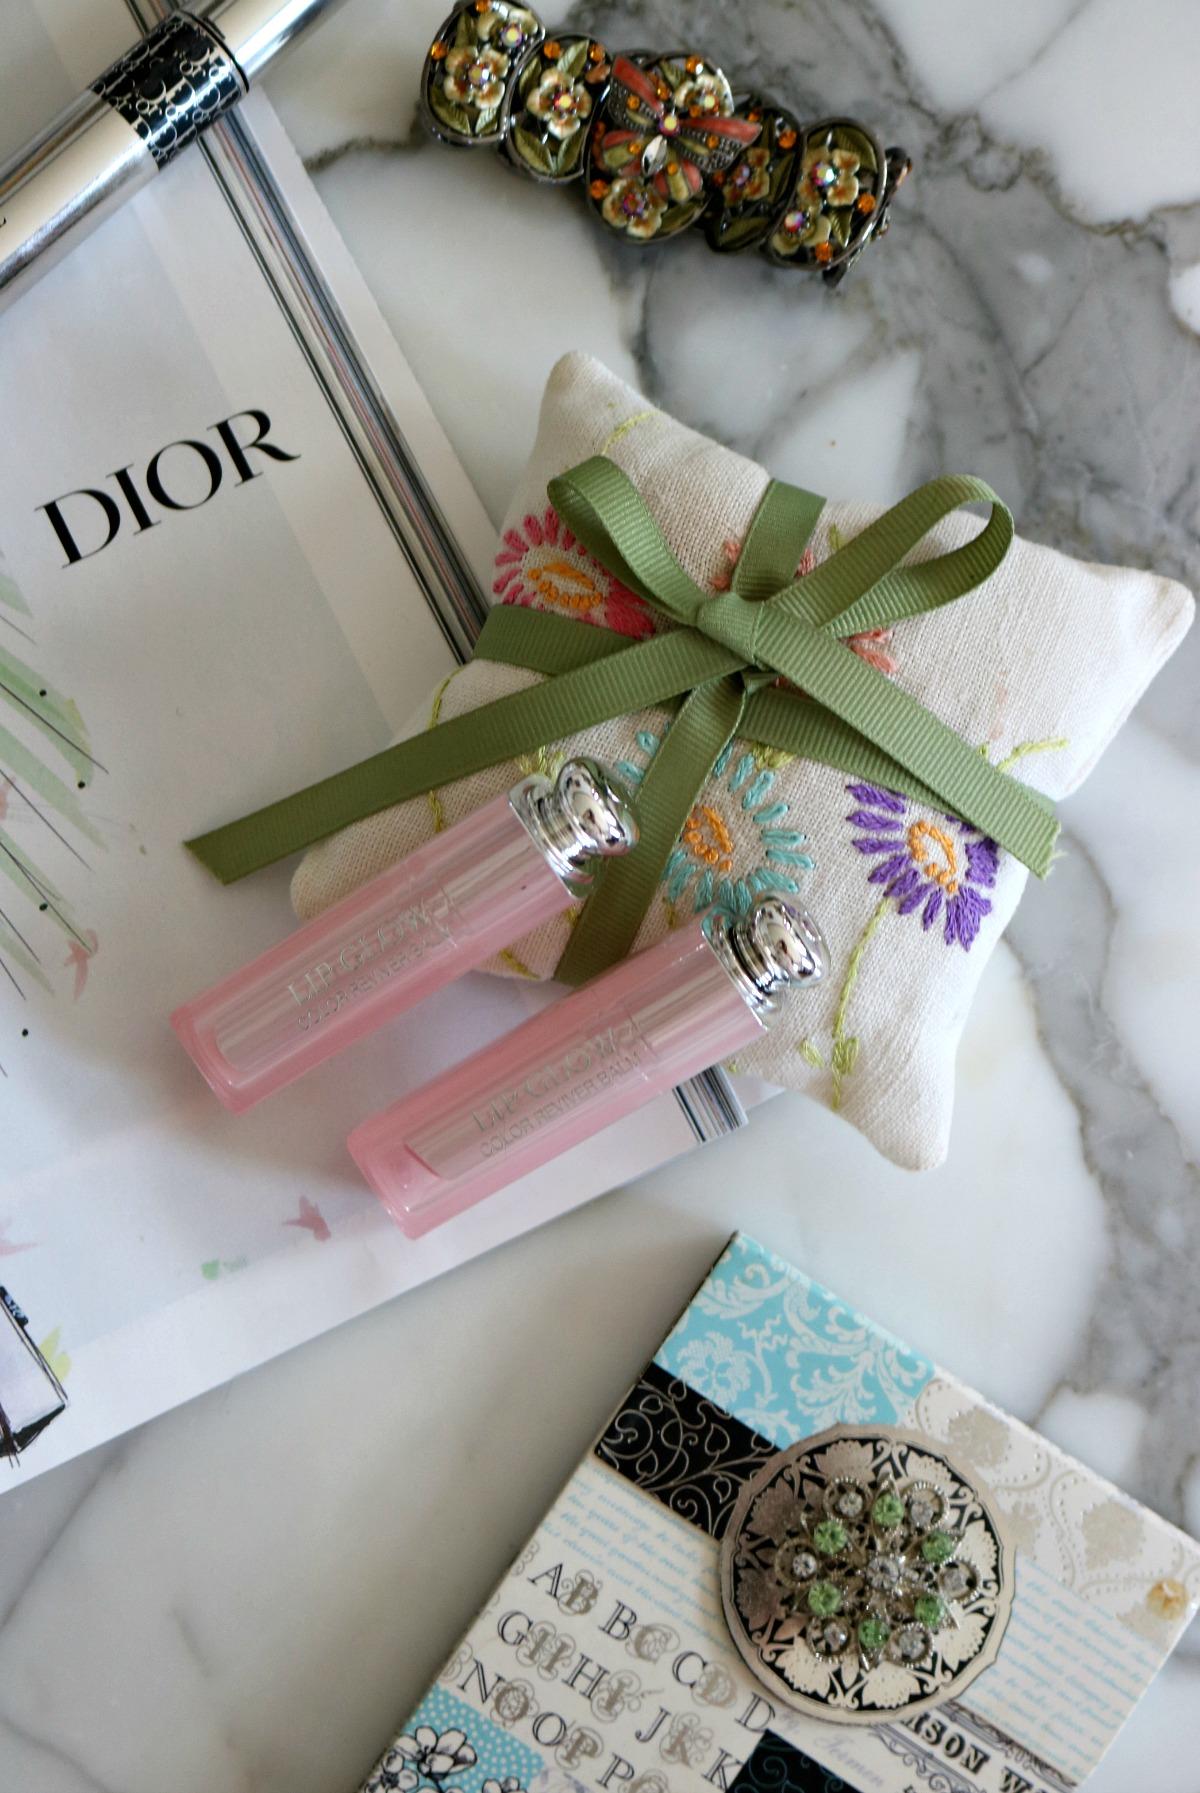 Dior Lip Glow Lipstick Review I DreaminLace.com #DiorMakeup #Dior #WinterBeauty